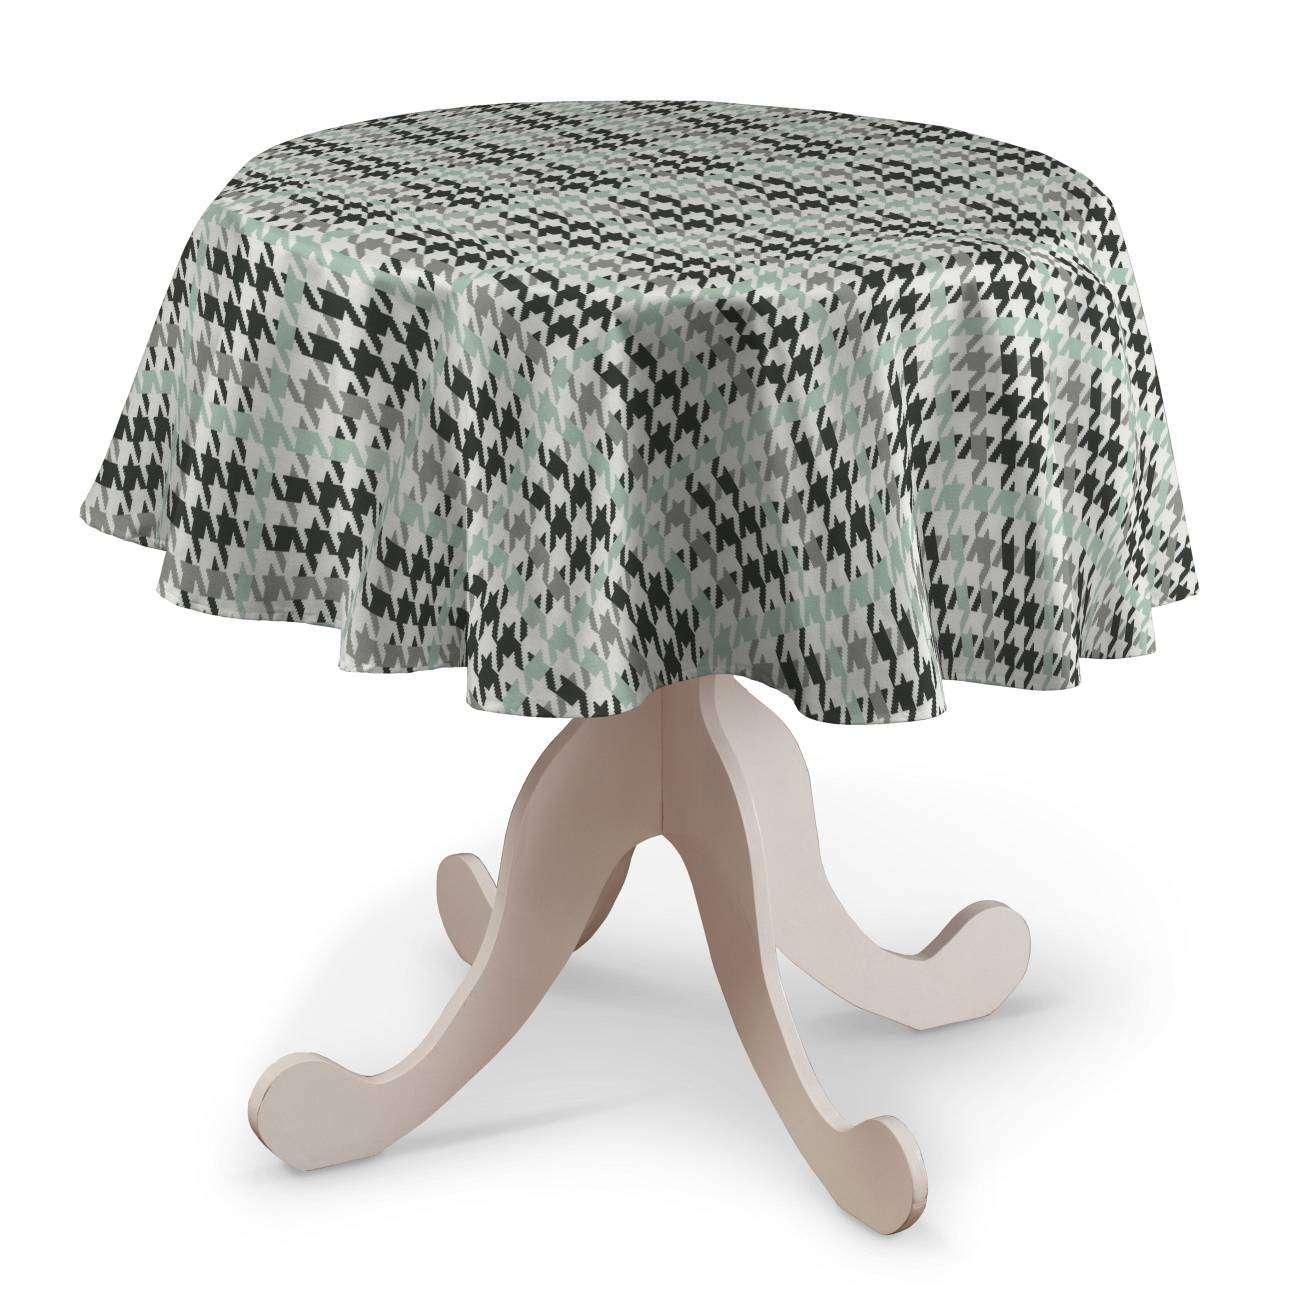 Rund bordsduk i kollektionen Brooklyn, Tyg: 137-77